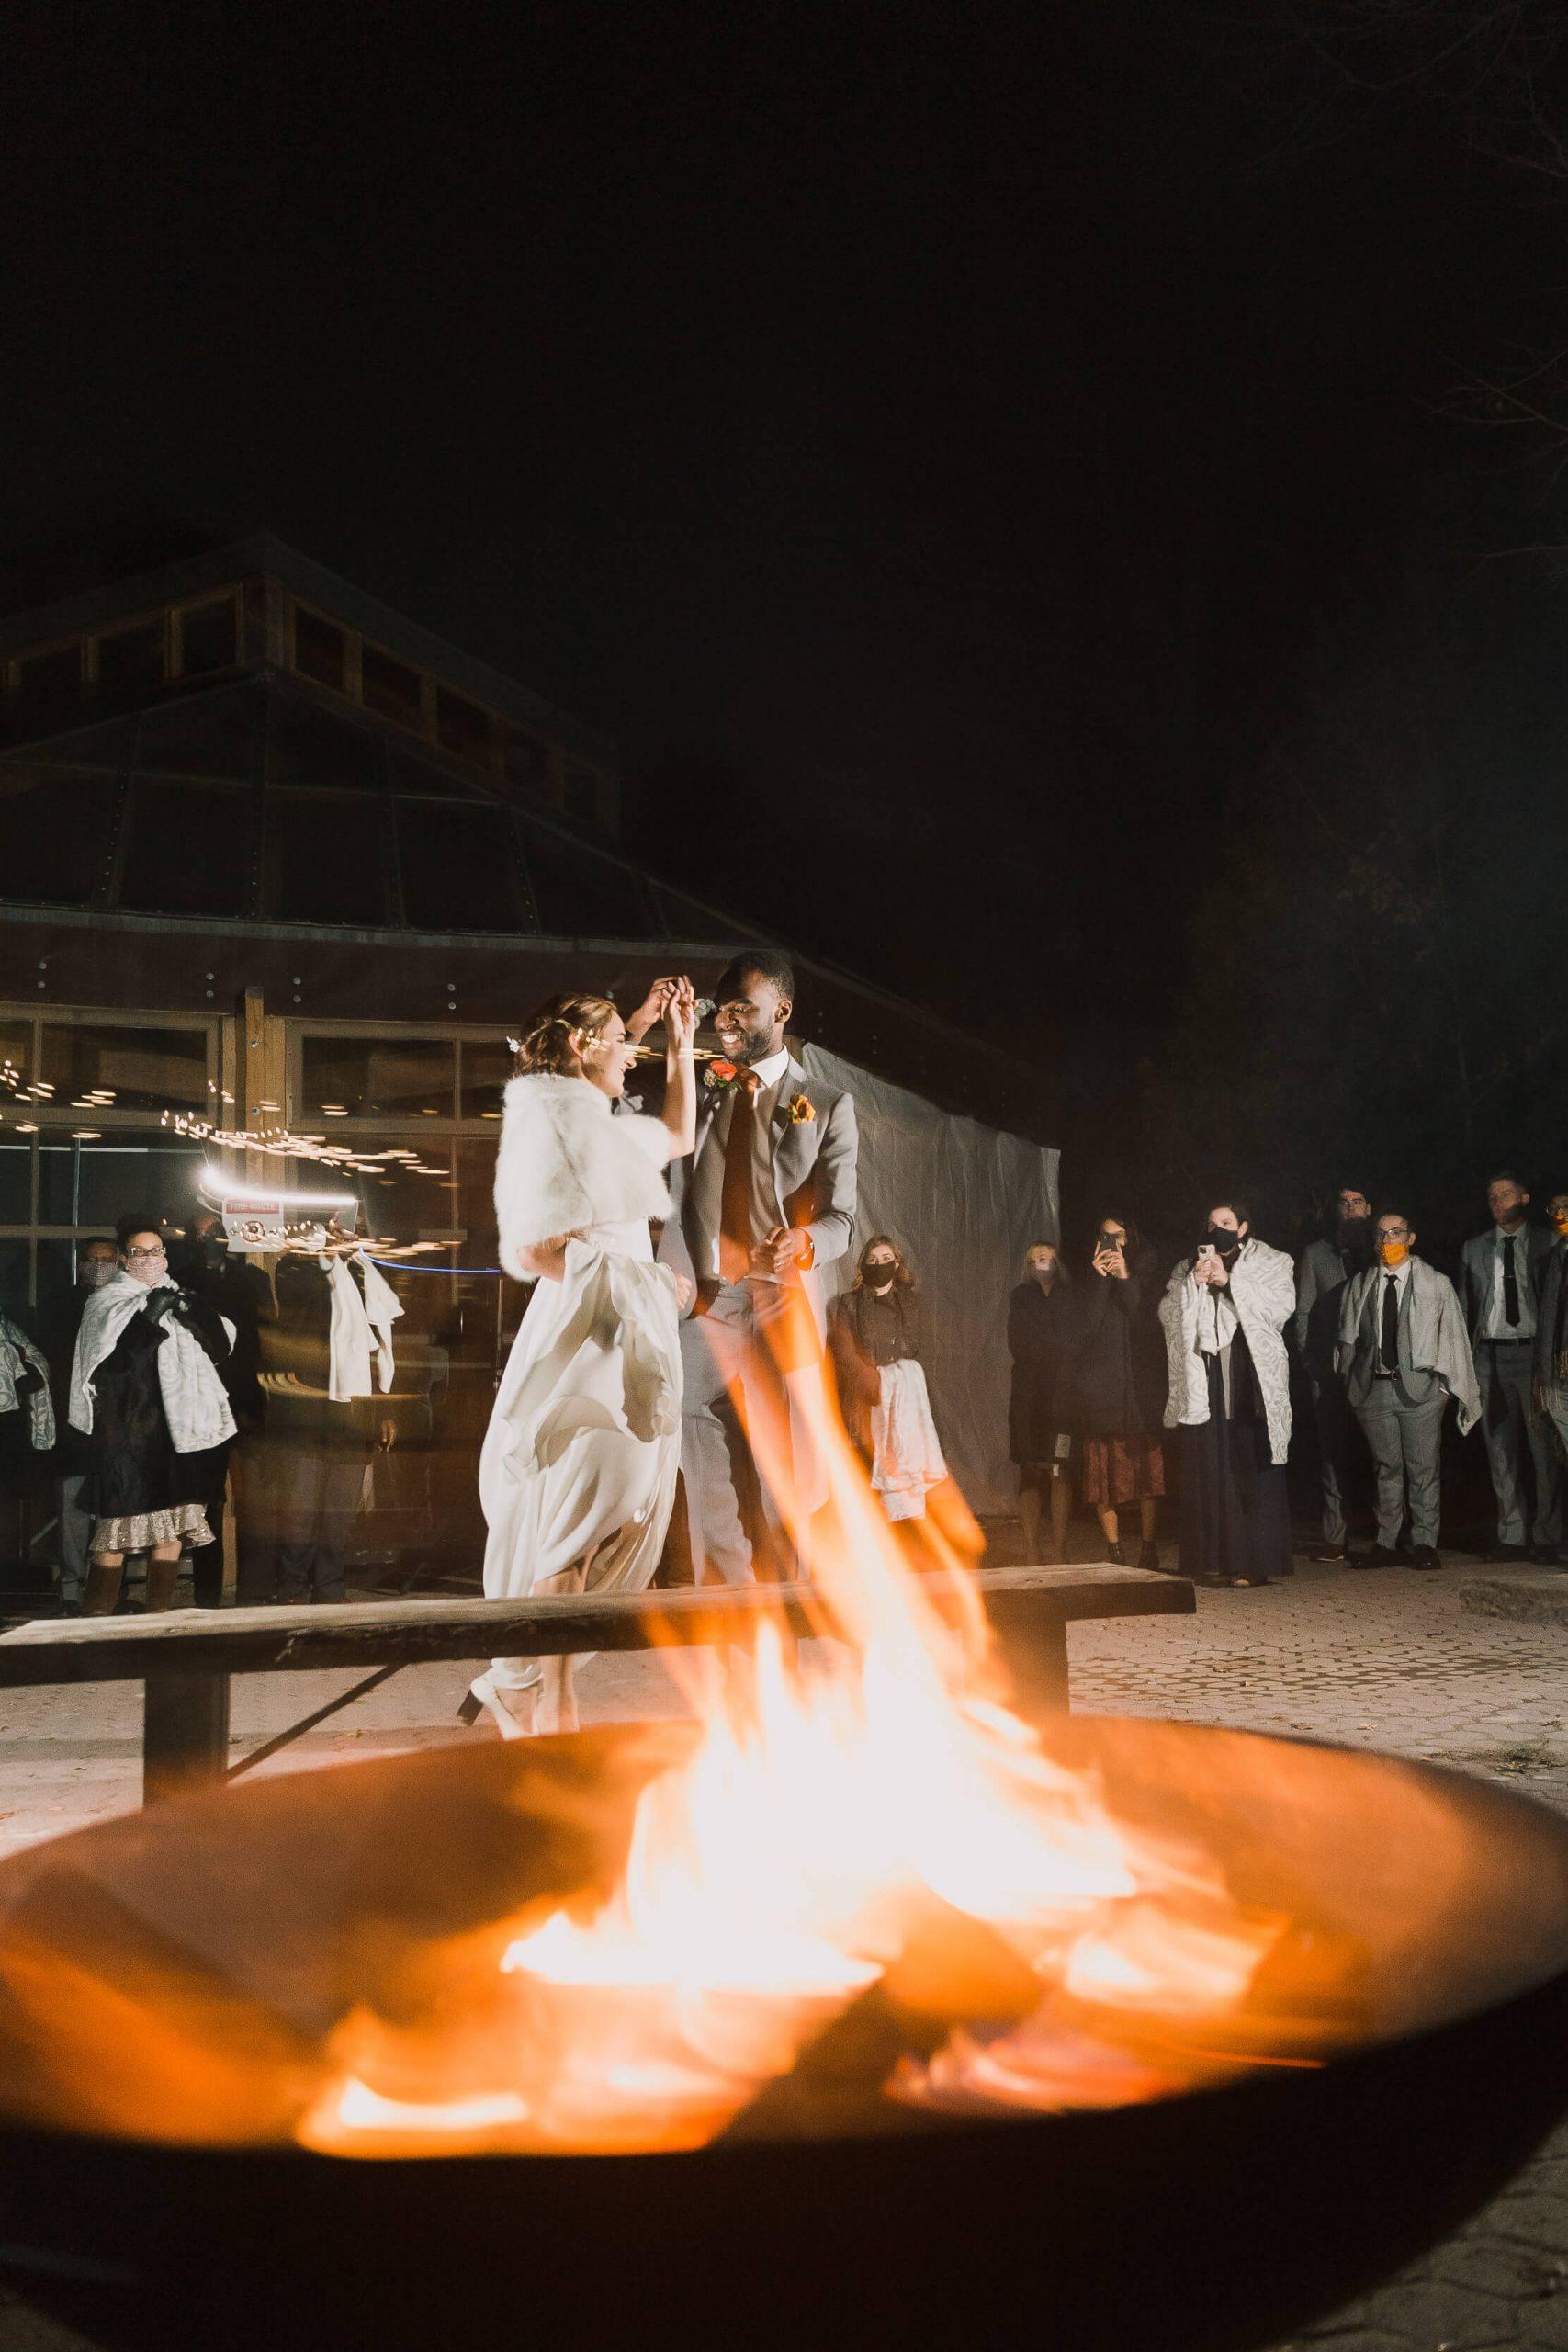 Fire Wedding - Sonia V Photo - Documentary Style Candid Photographer - Ottawa Ontario Kemptville Destination Photographer - Authentic Colour Photography - Wedding Photographer - Branding Photographer - Small Business Headshots - Engagement Photos - Family Portraits - Lifestyle